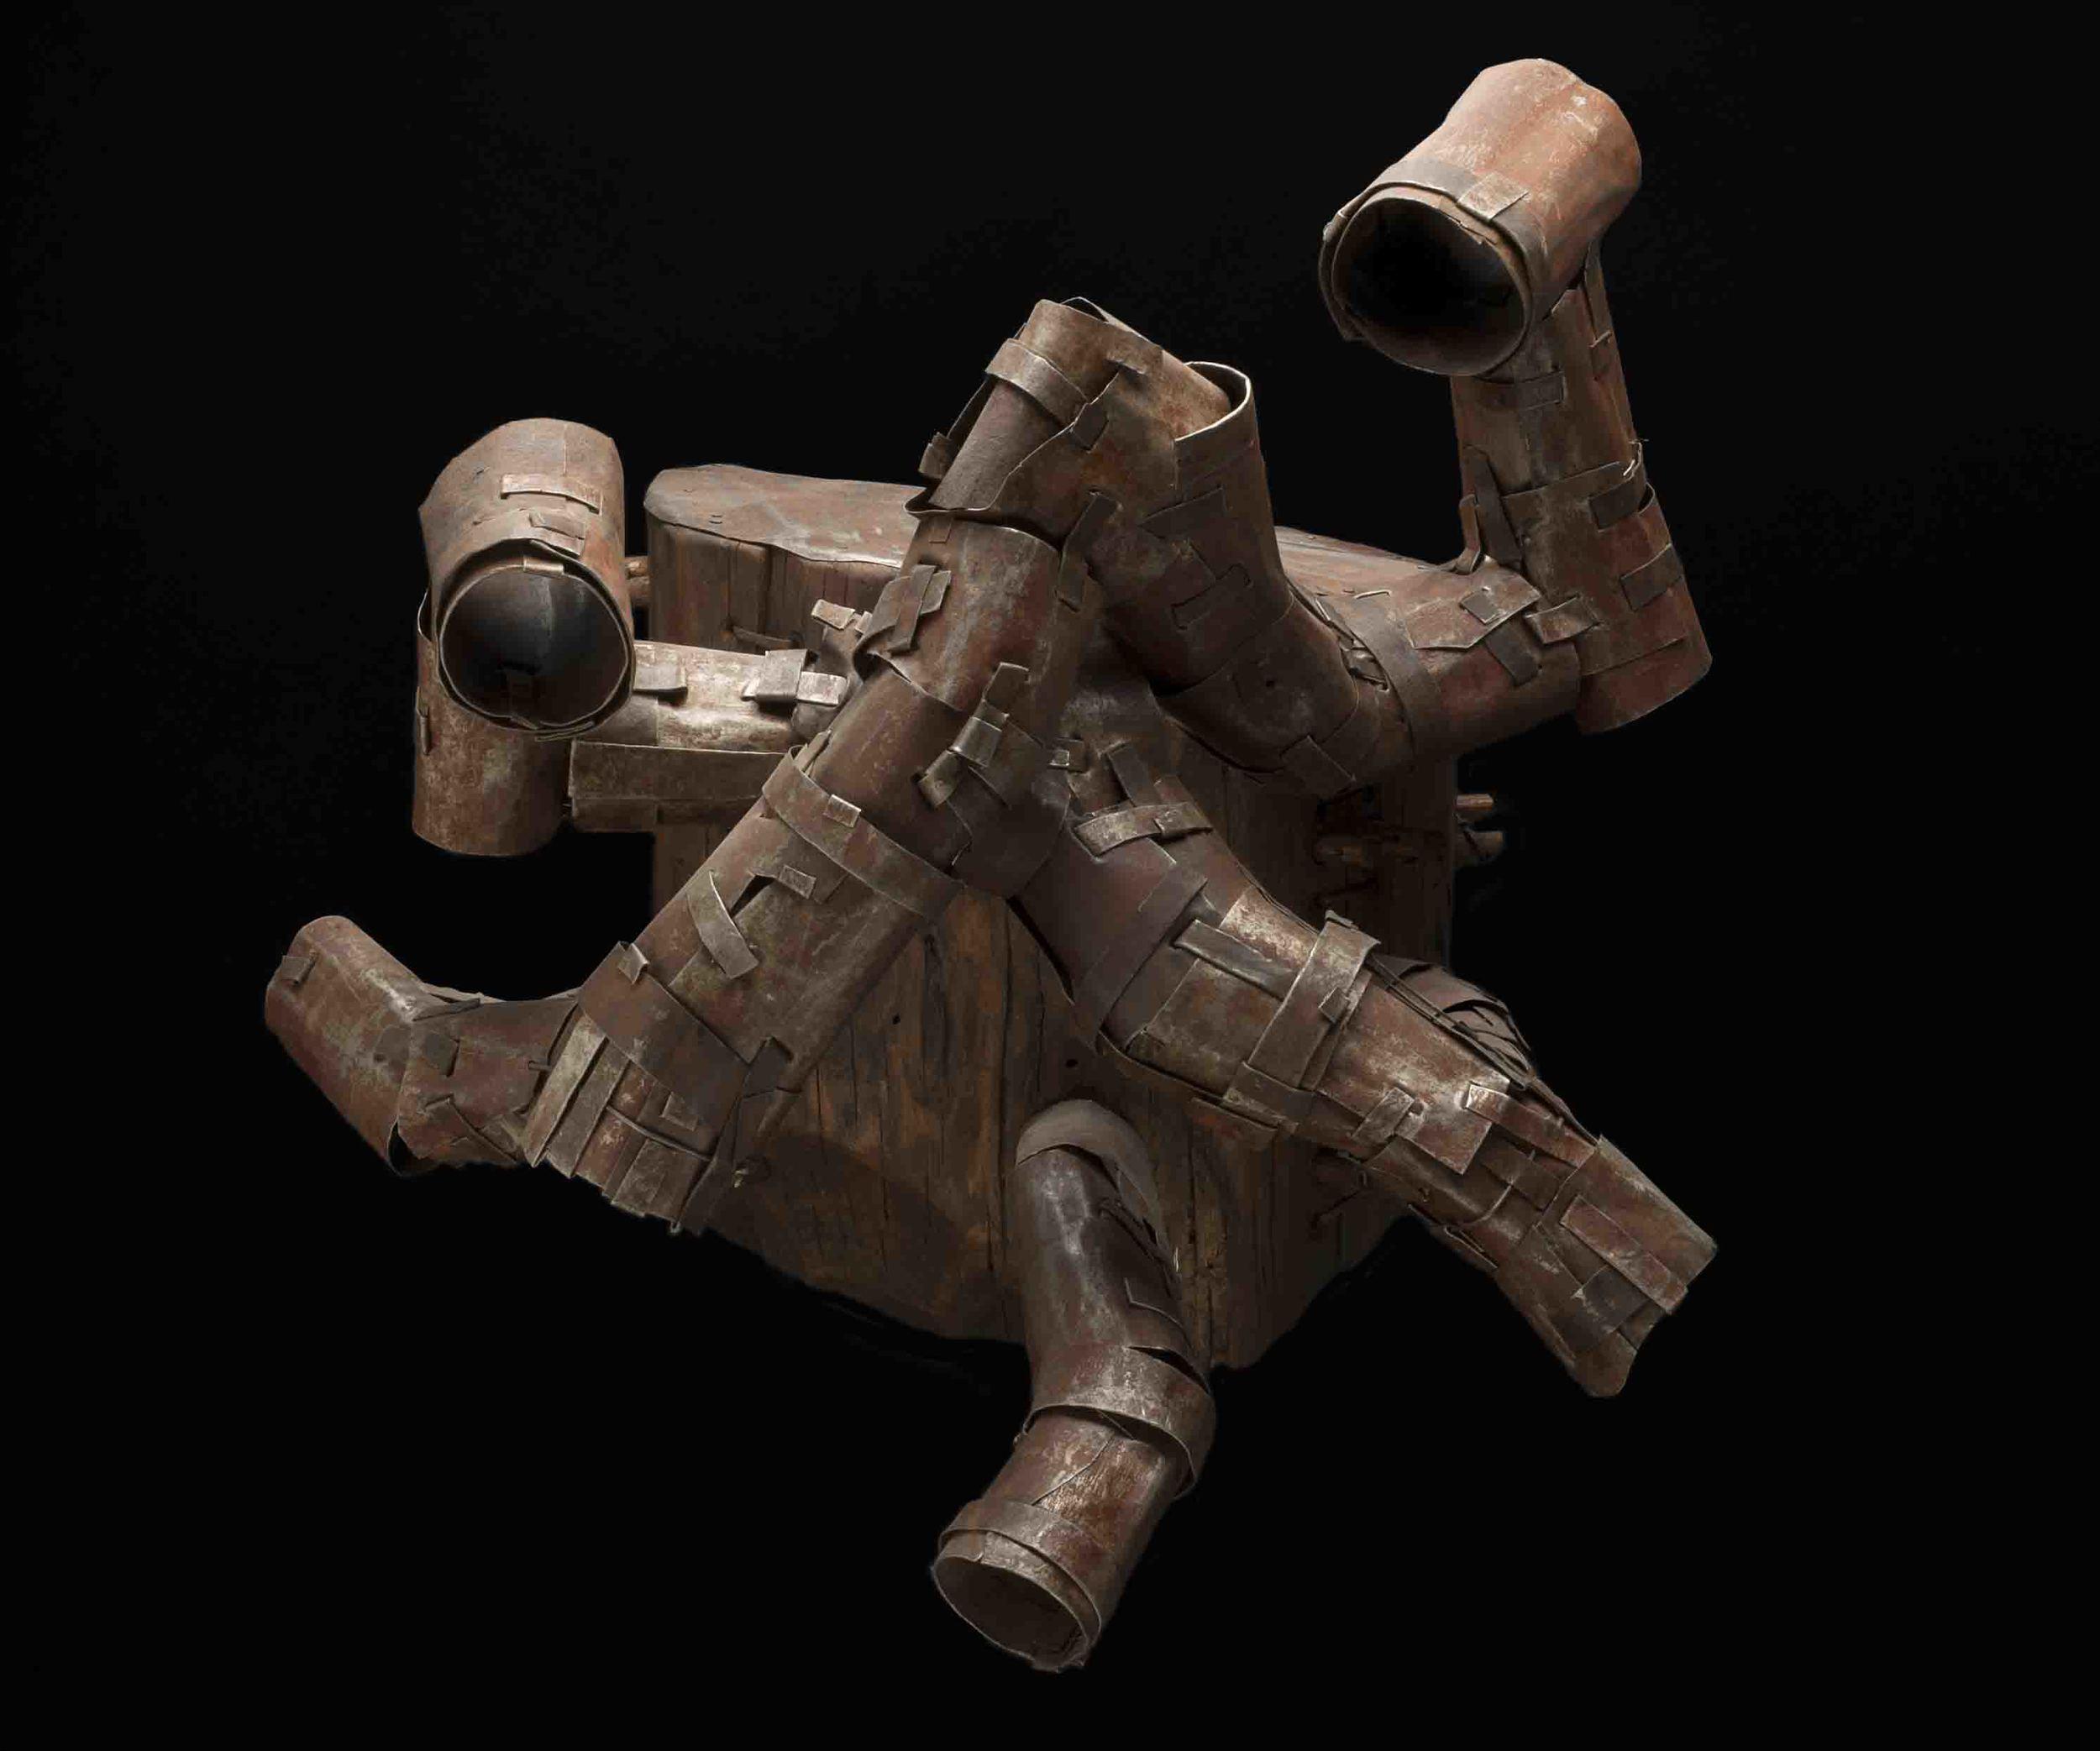 Keith Goodhart Tube Head, 2009 Roofing metal, wood / 15 x 18 x 15 inches (38.1 x 45.7 x 38.1 cm) / GK 217